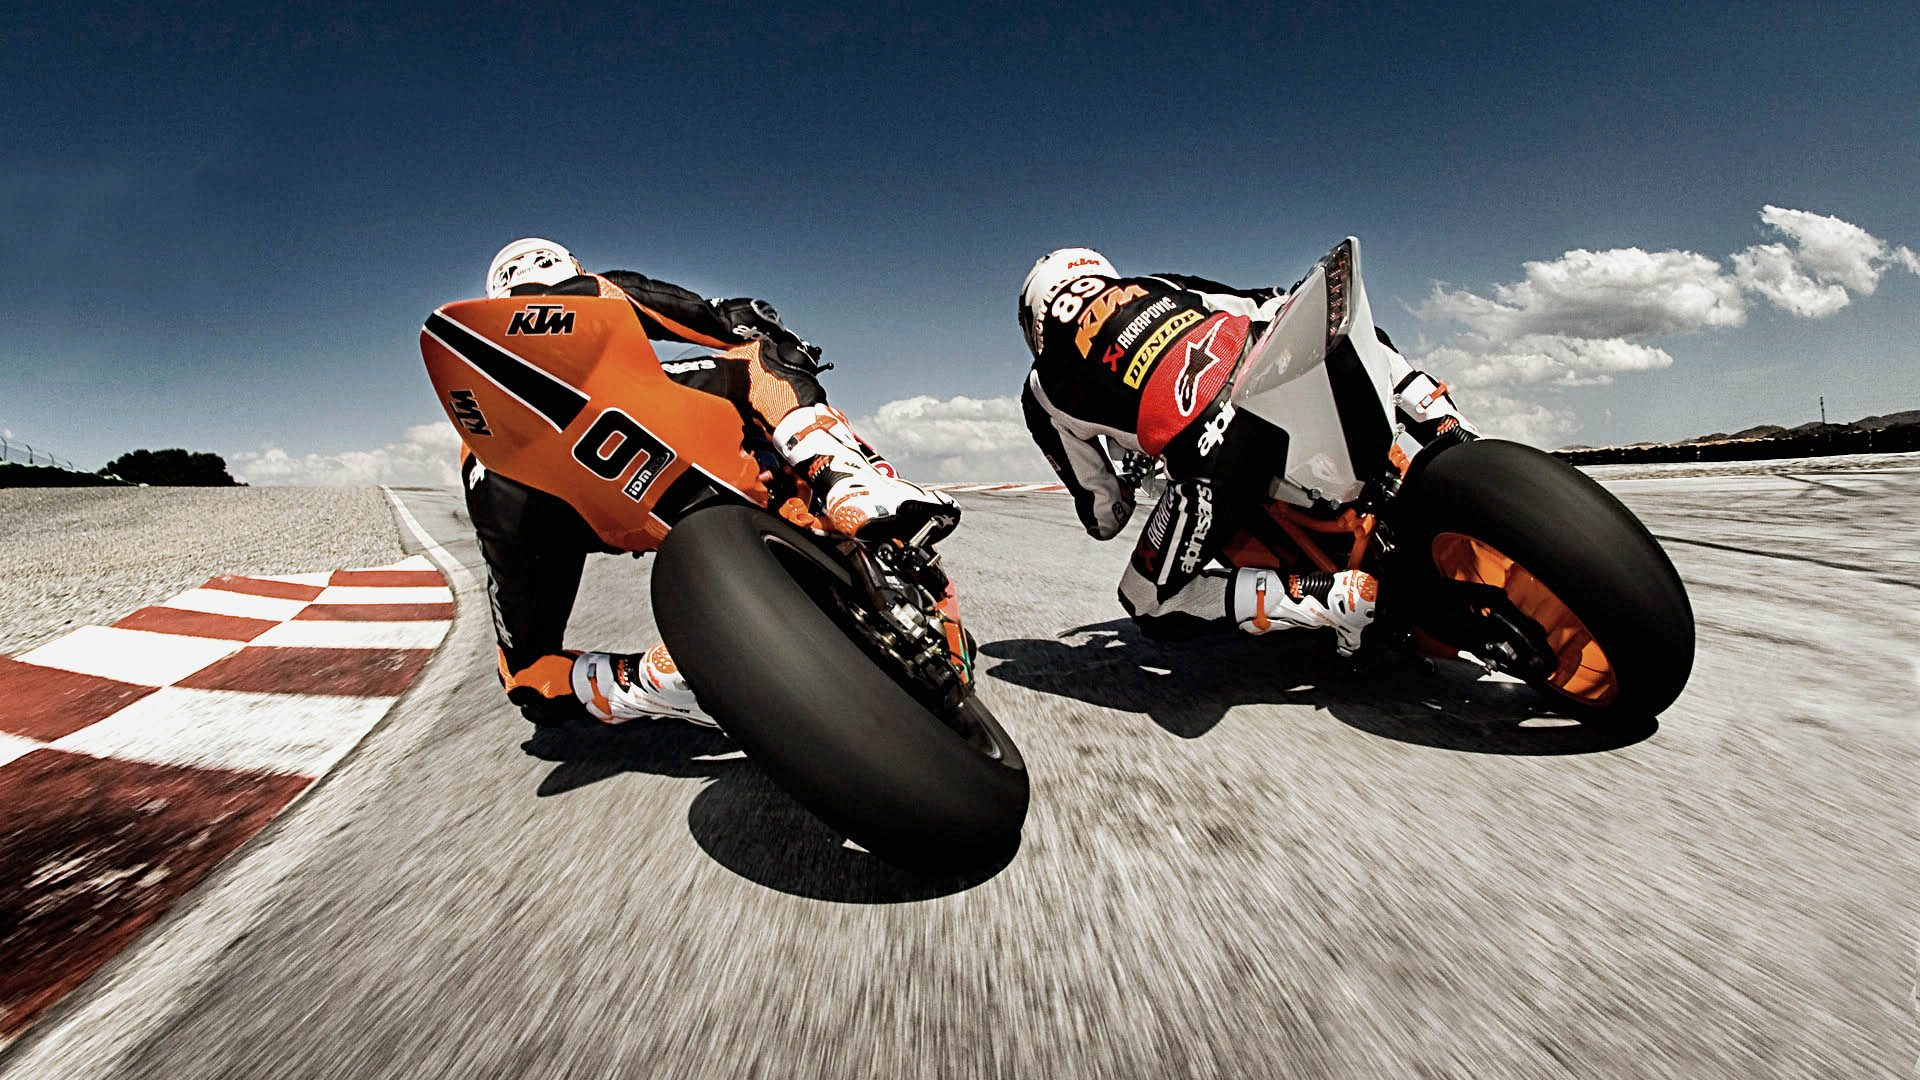 KTM Considers Going Full Factory in MotoGP in 2017 - autoevolution